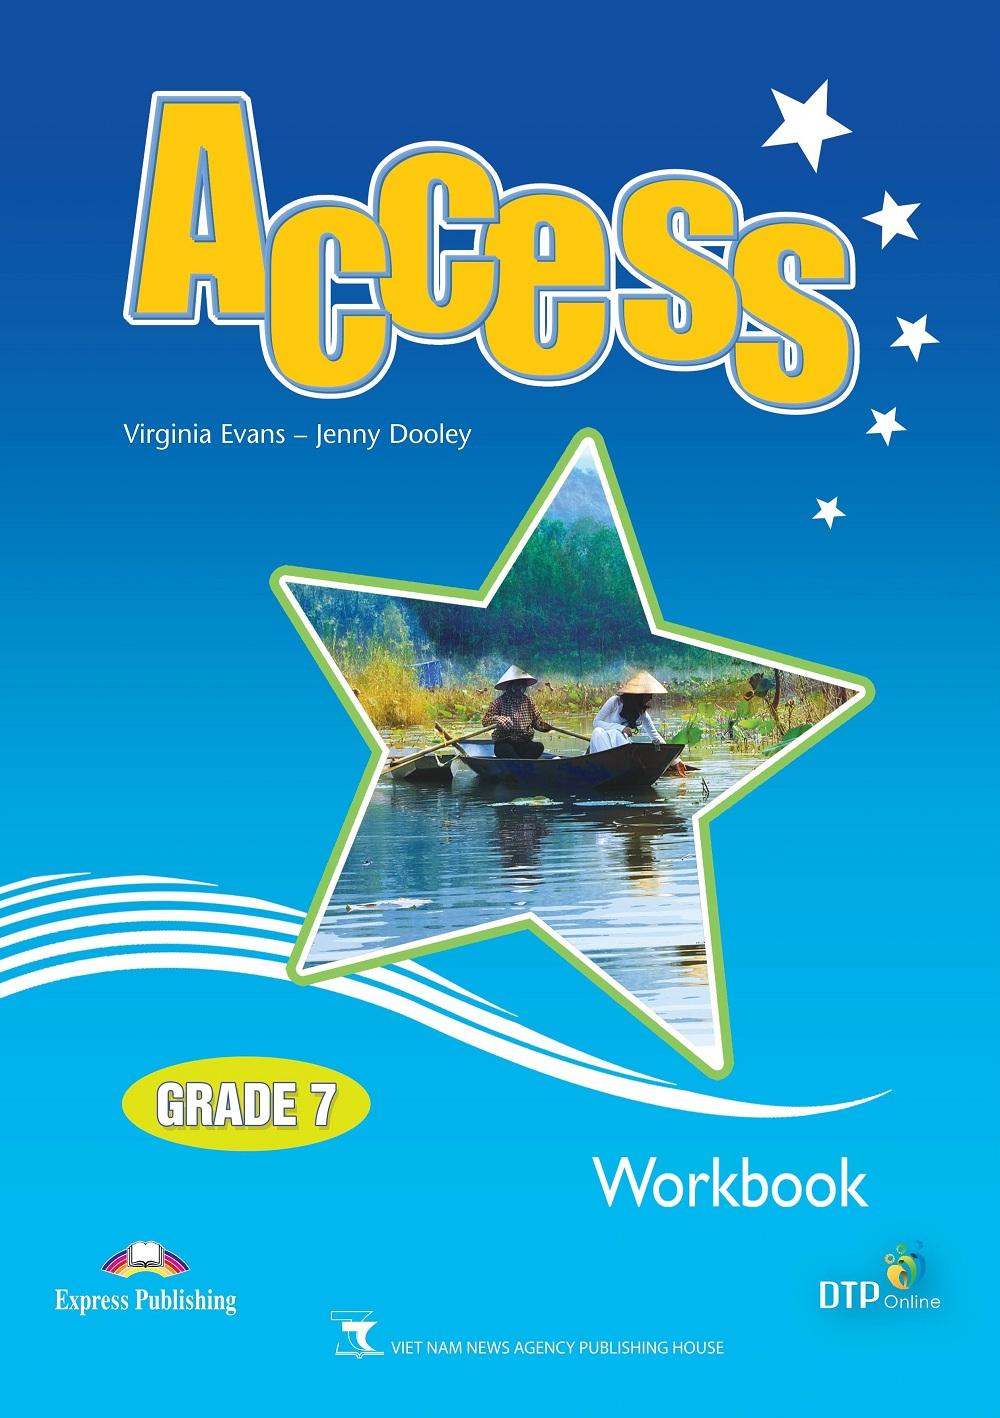 Access Grade 7 Workbook - 9786049458019,62_273524,107000,tiki.vn,Access-Grade-7-Workbook-62_273524,Access Grade 7 Workbook